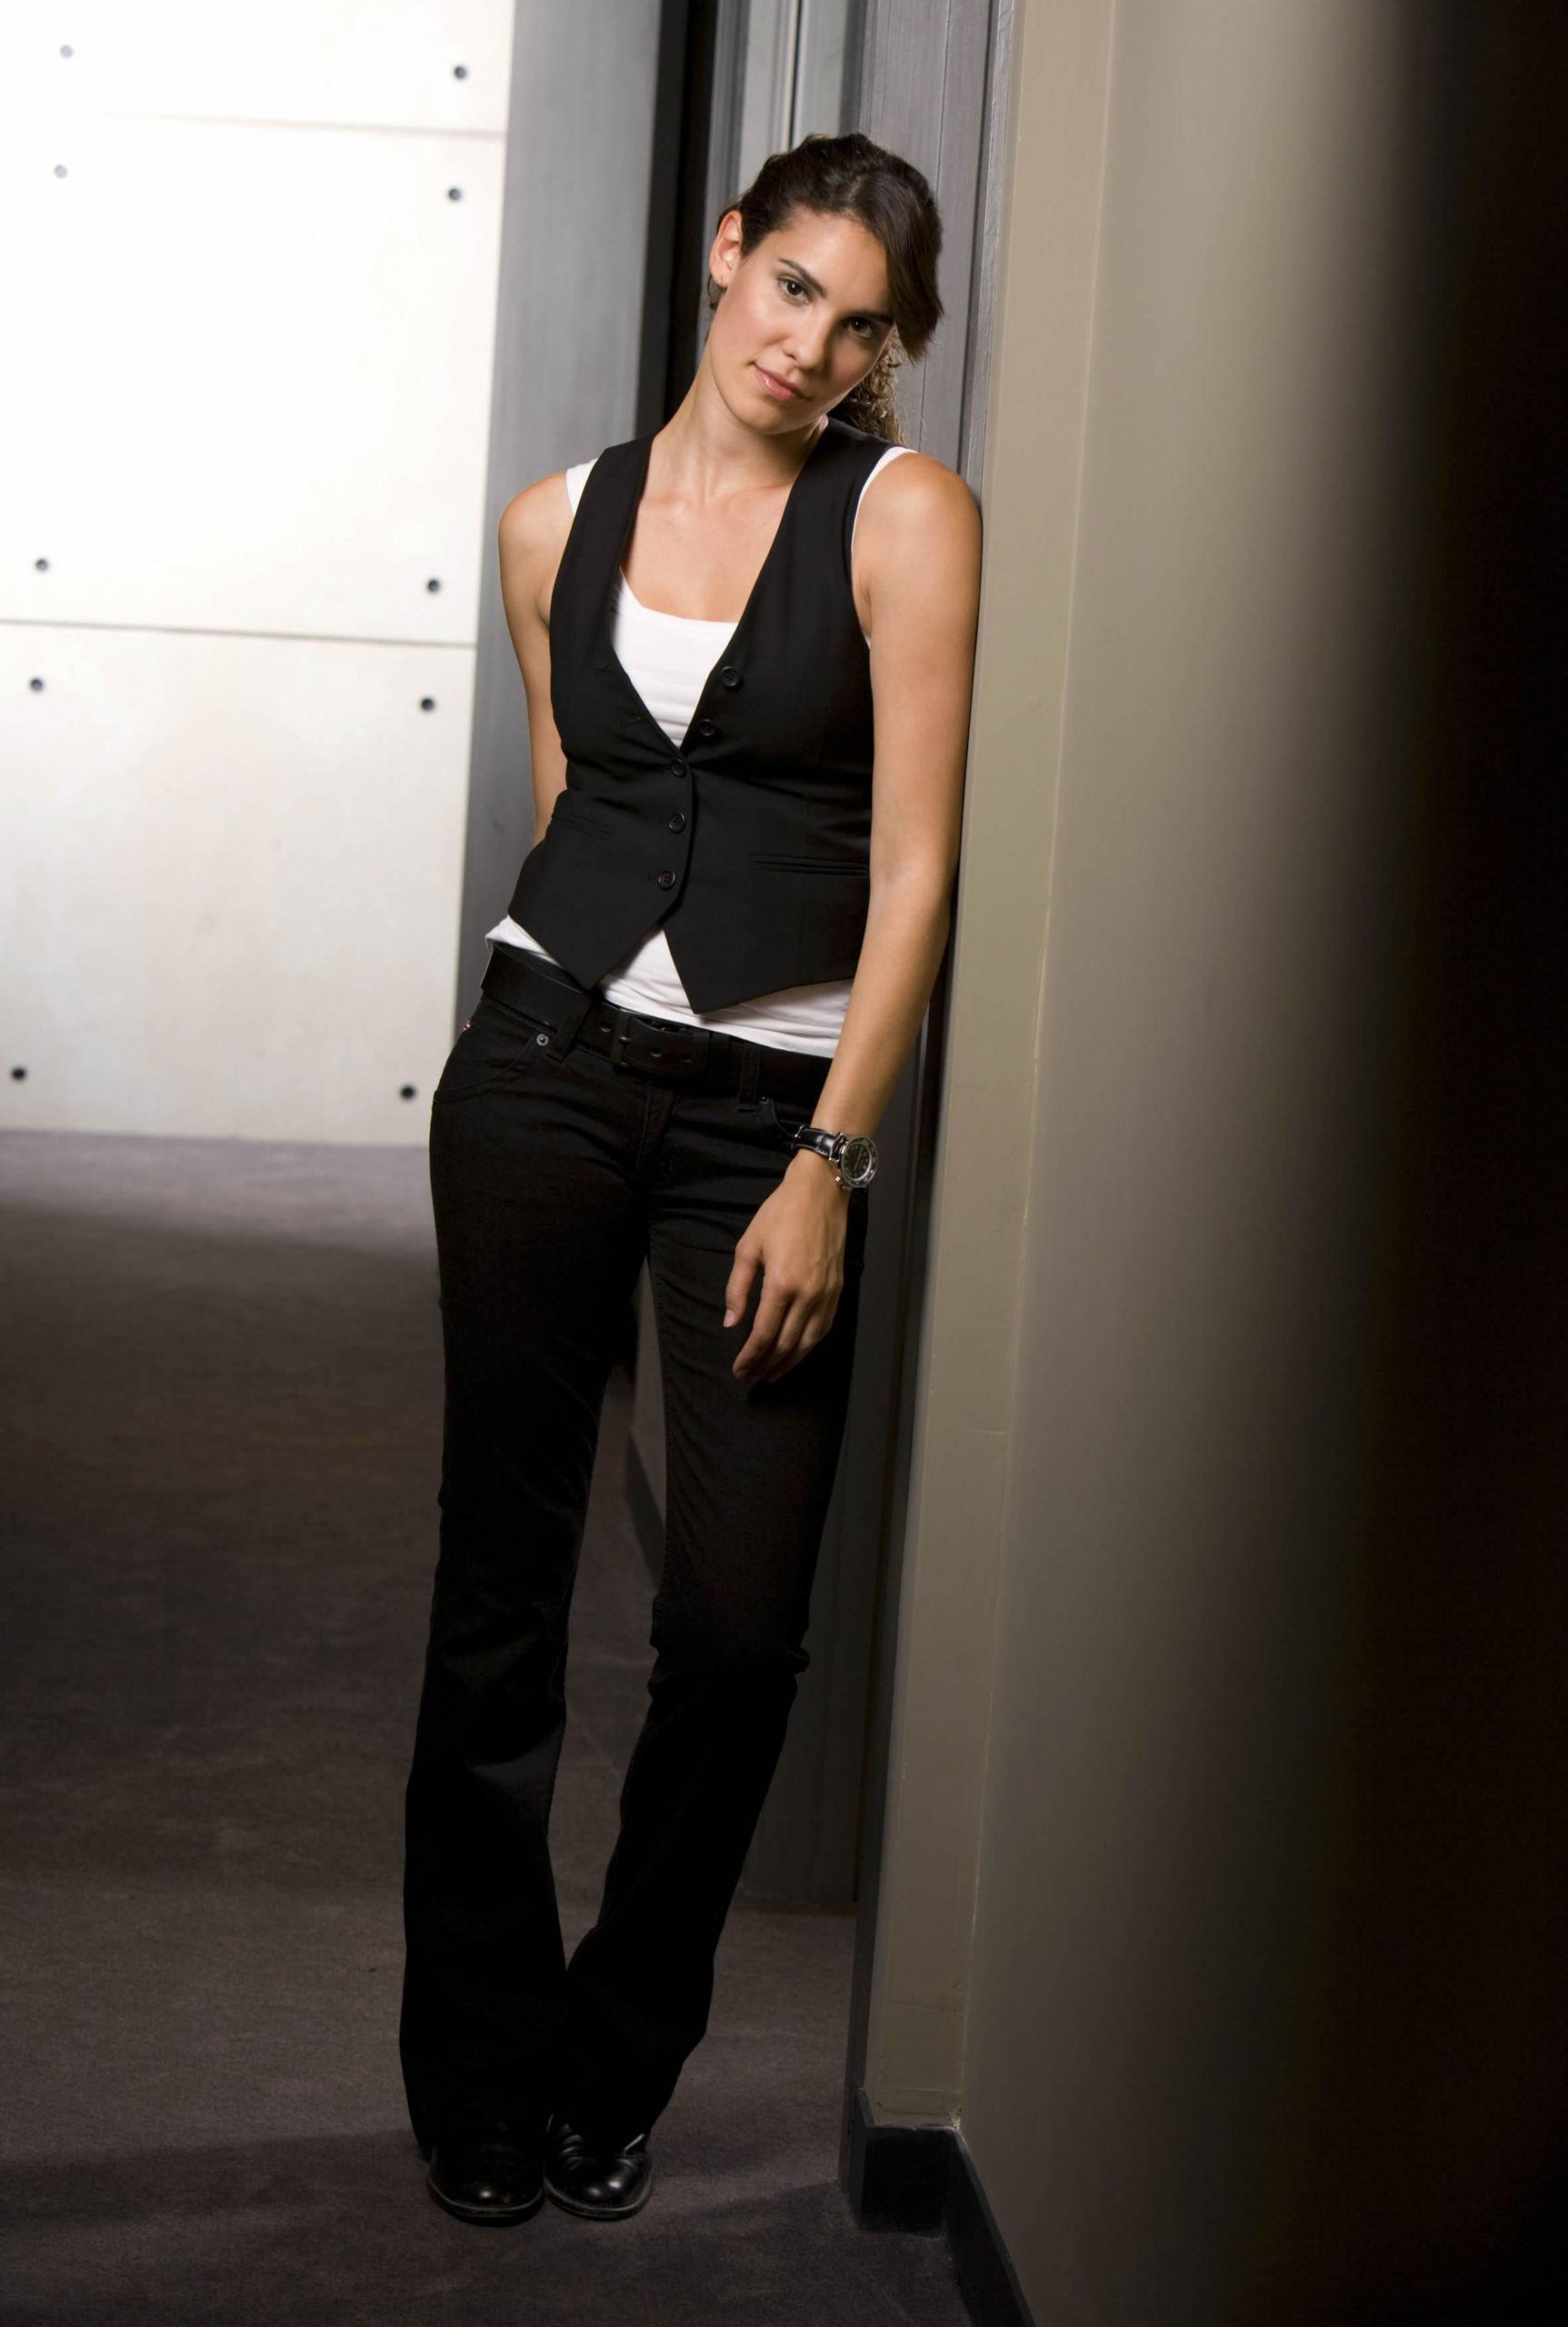 Daniela @ NCIS Los Angeles [More Promotional Photos]